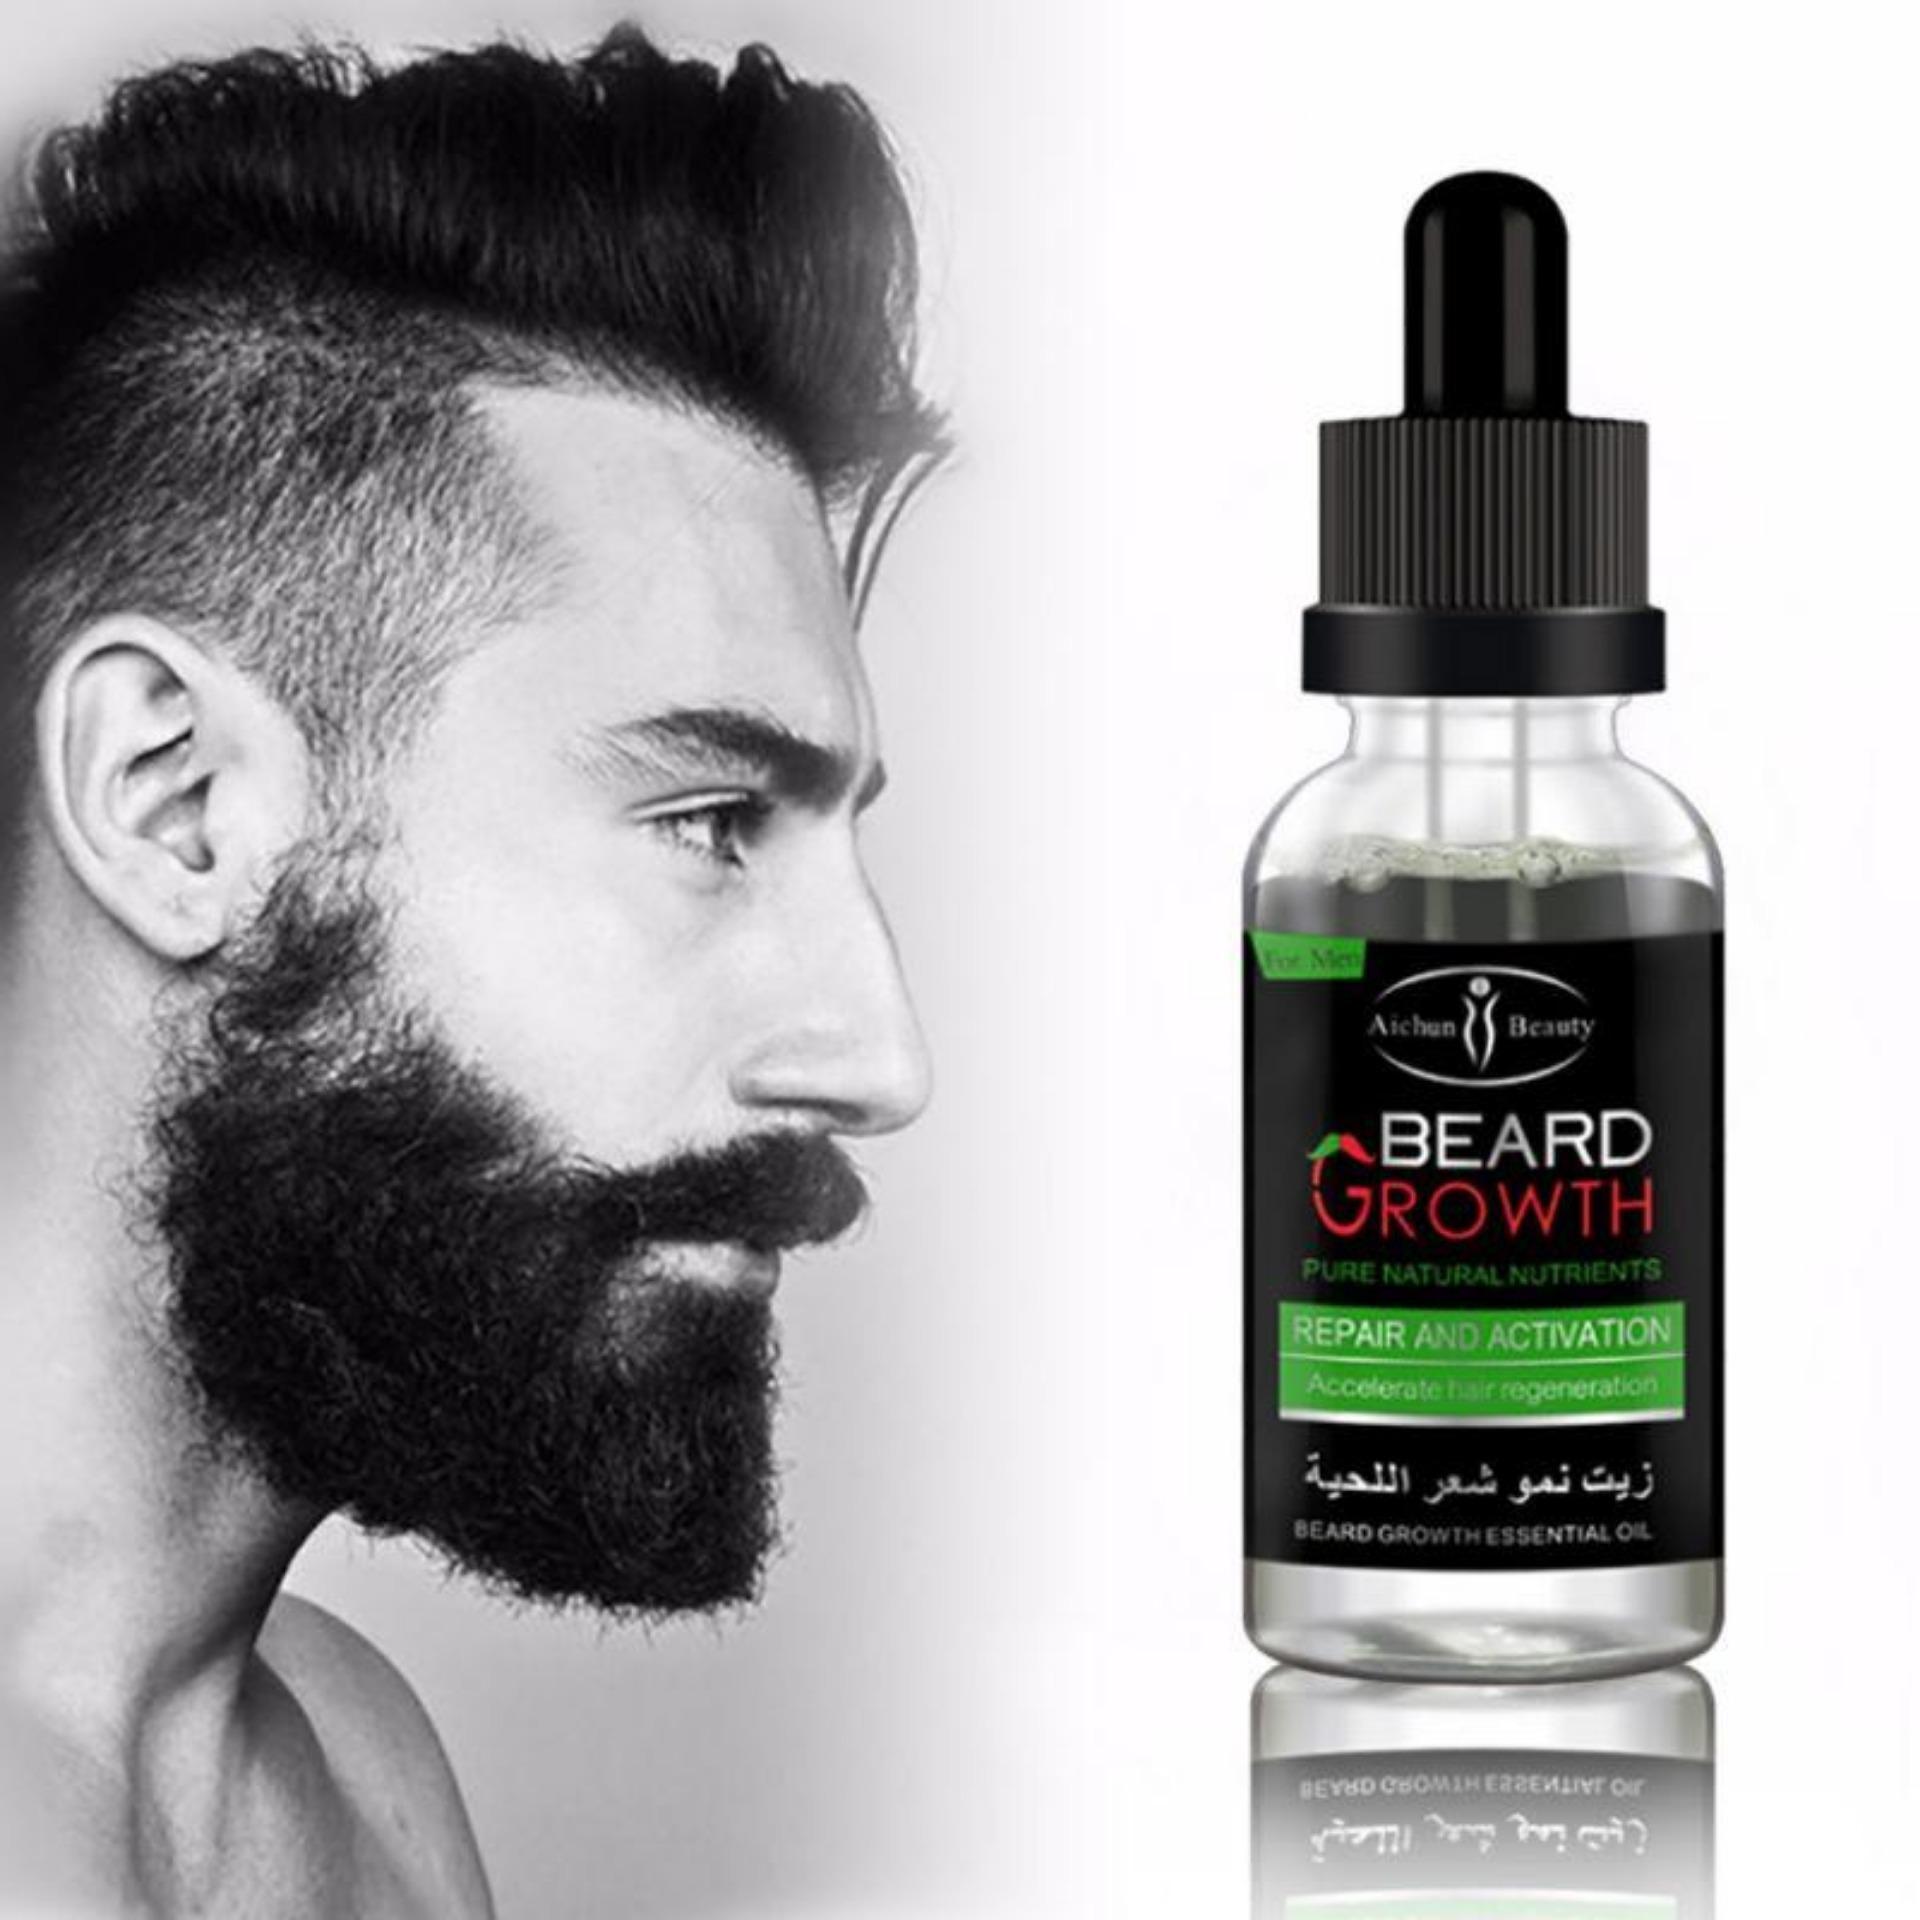 Professional Men Beard Growth Enhancer Facial Nutrition Moustache Grow Beard Shaping Beard care Oil